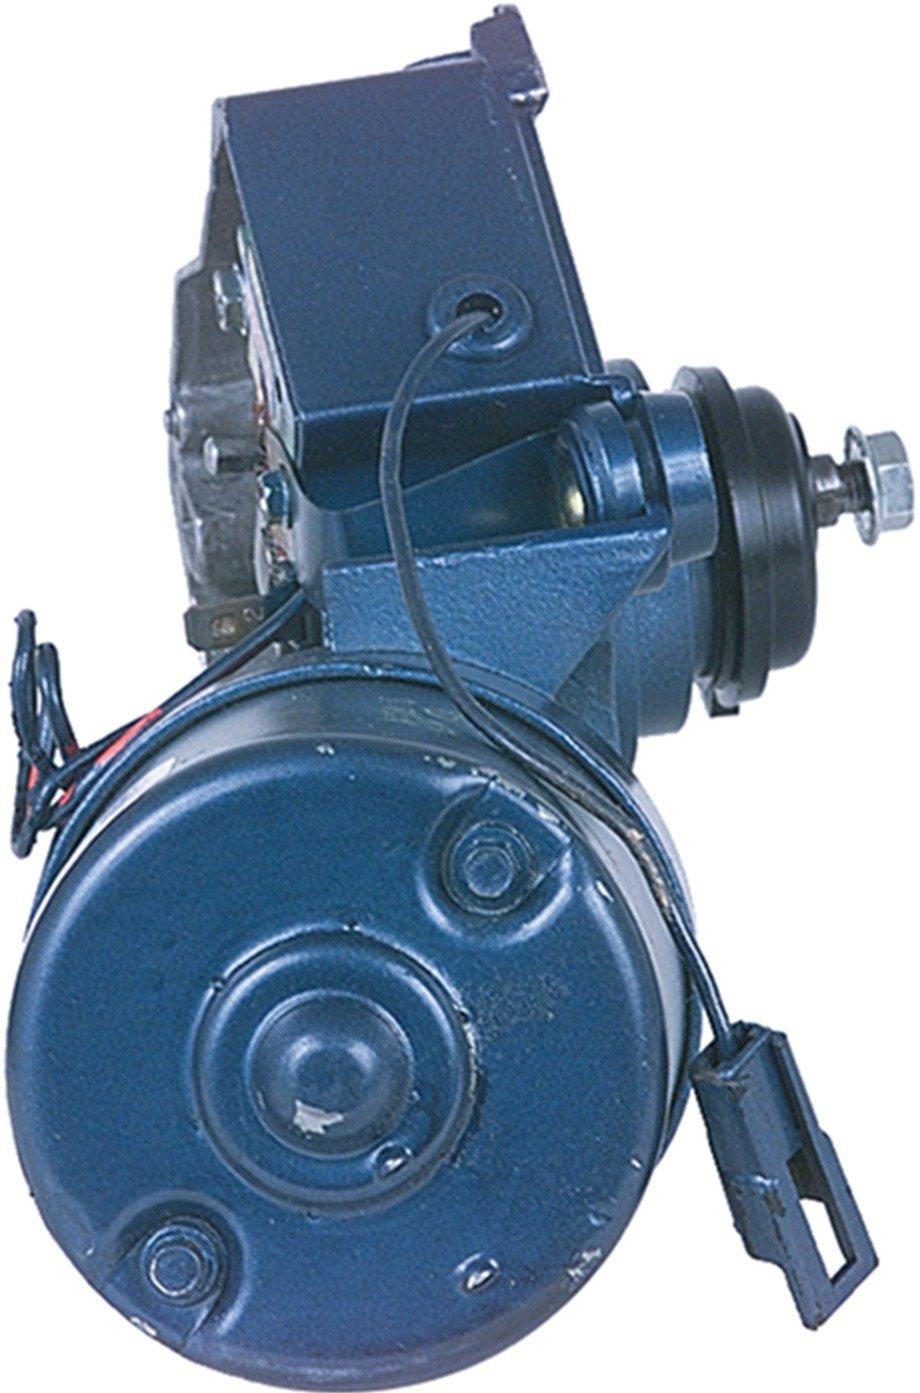 Cardone 40-152 Wiper Motor A1 Cardone